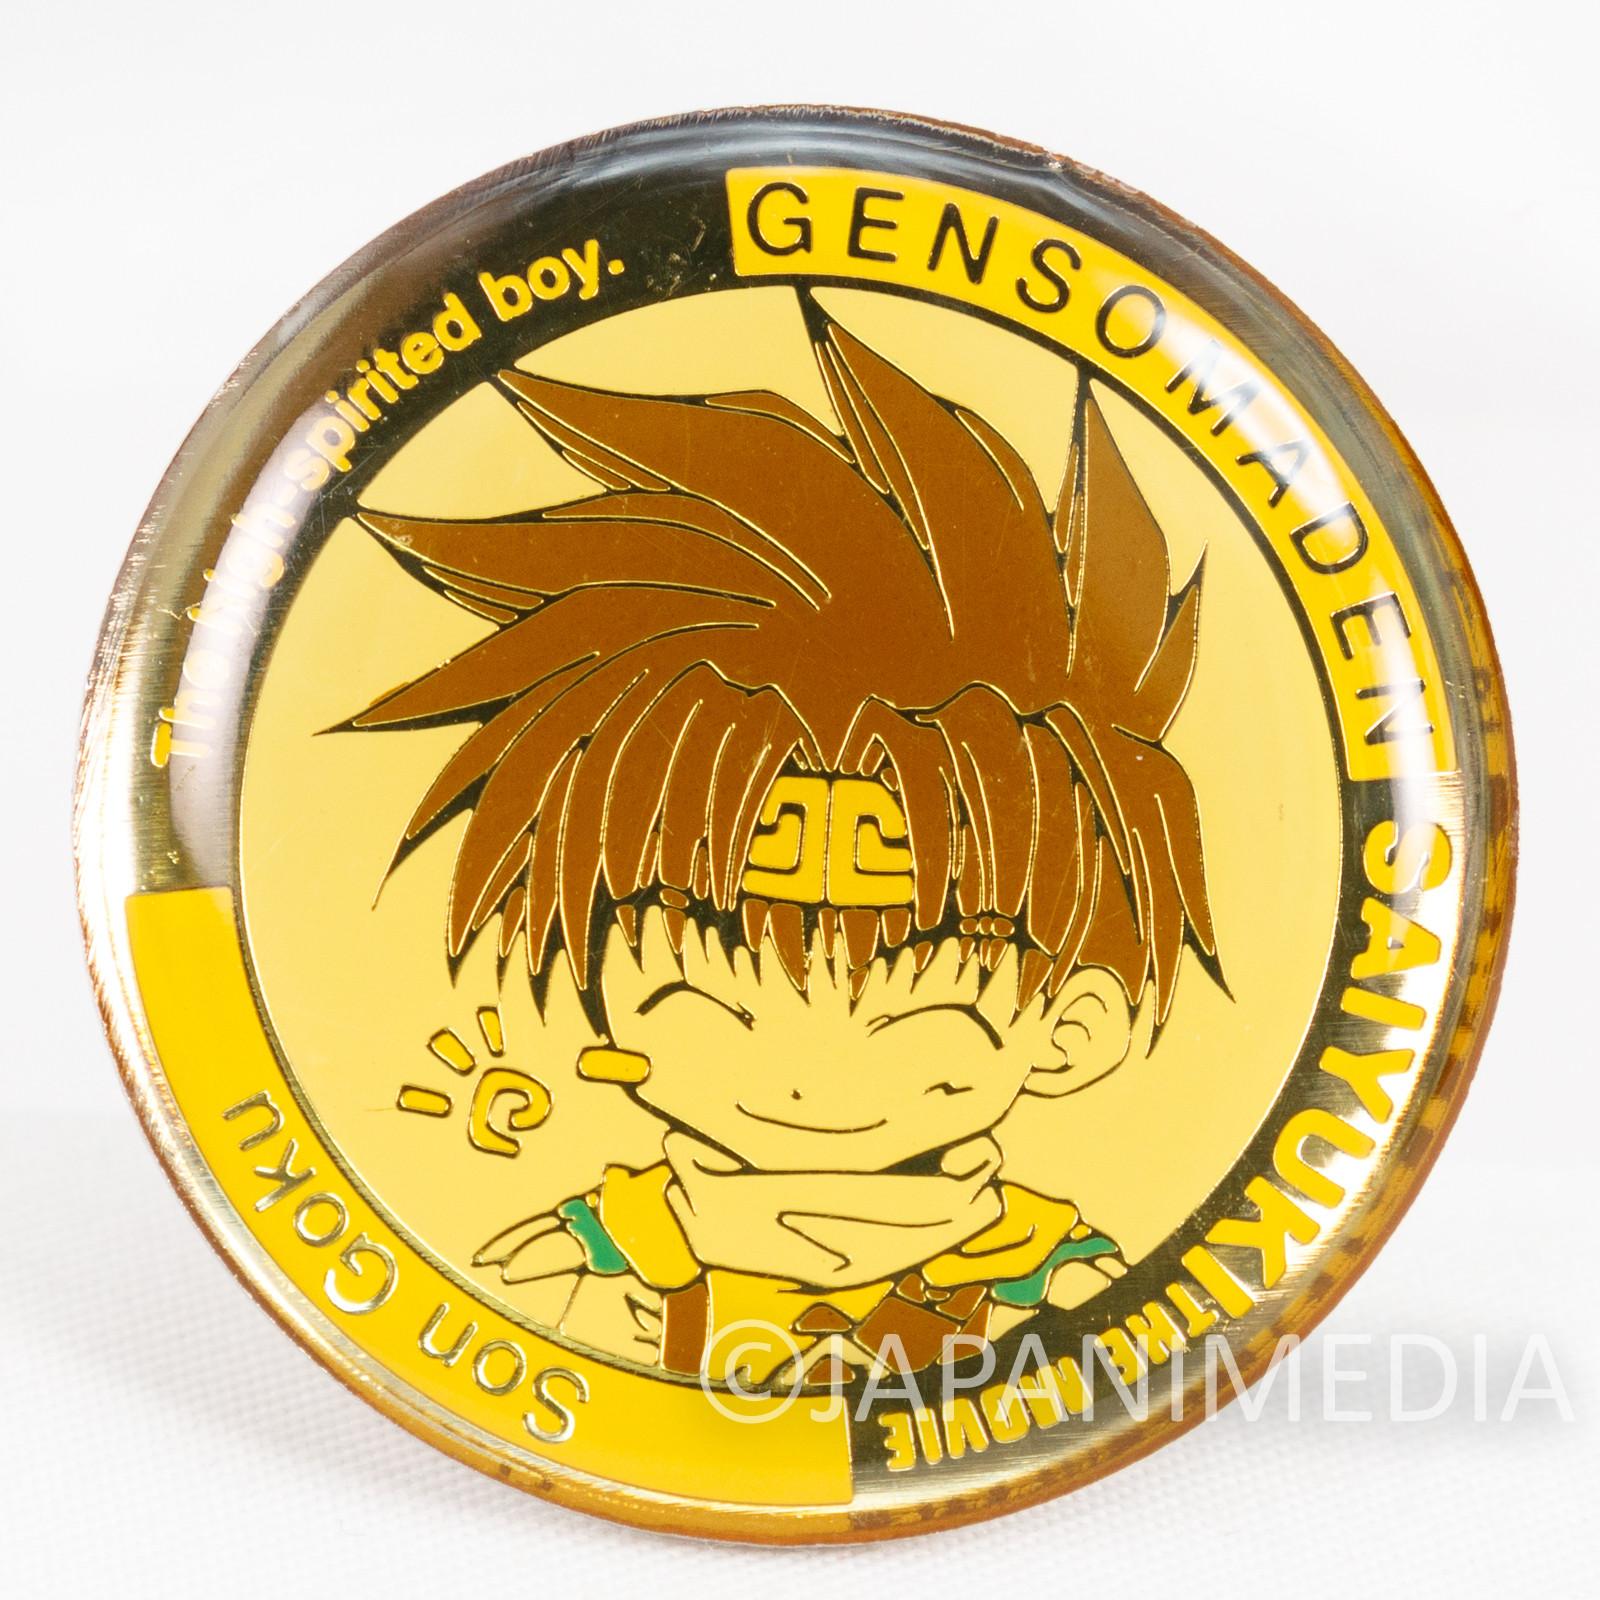 Gensomaden SAIYUKI Son Goku Metal Pins NO PACKAGE